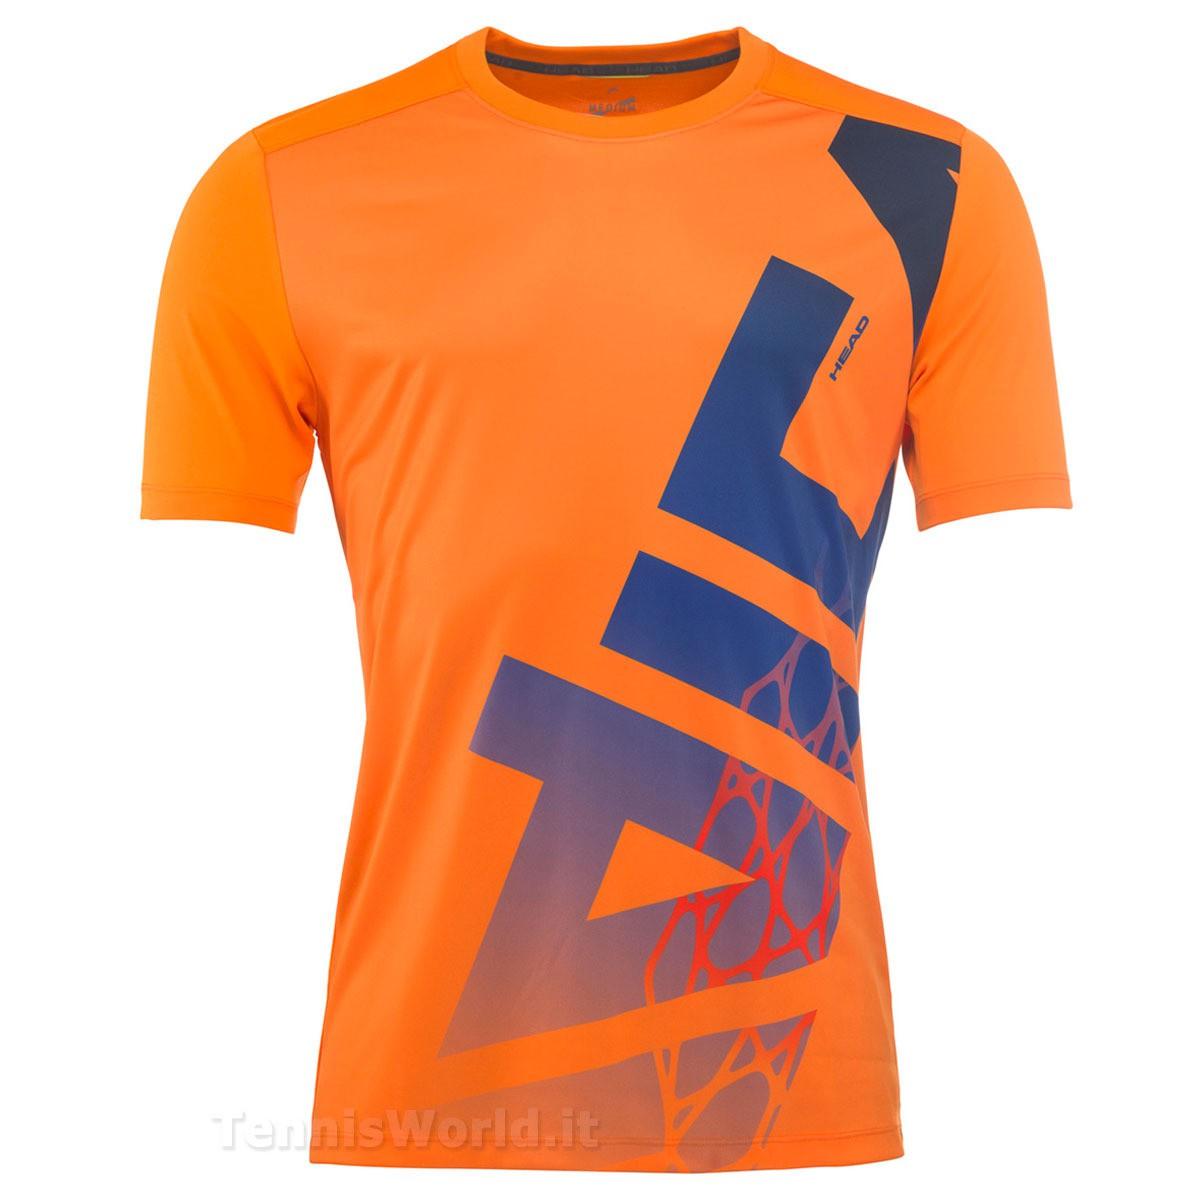 Head Vision Radical T-Shirt Arancione Uomo